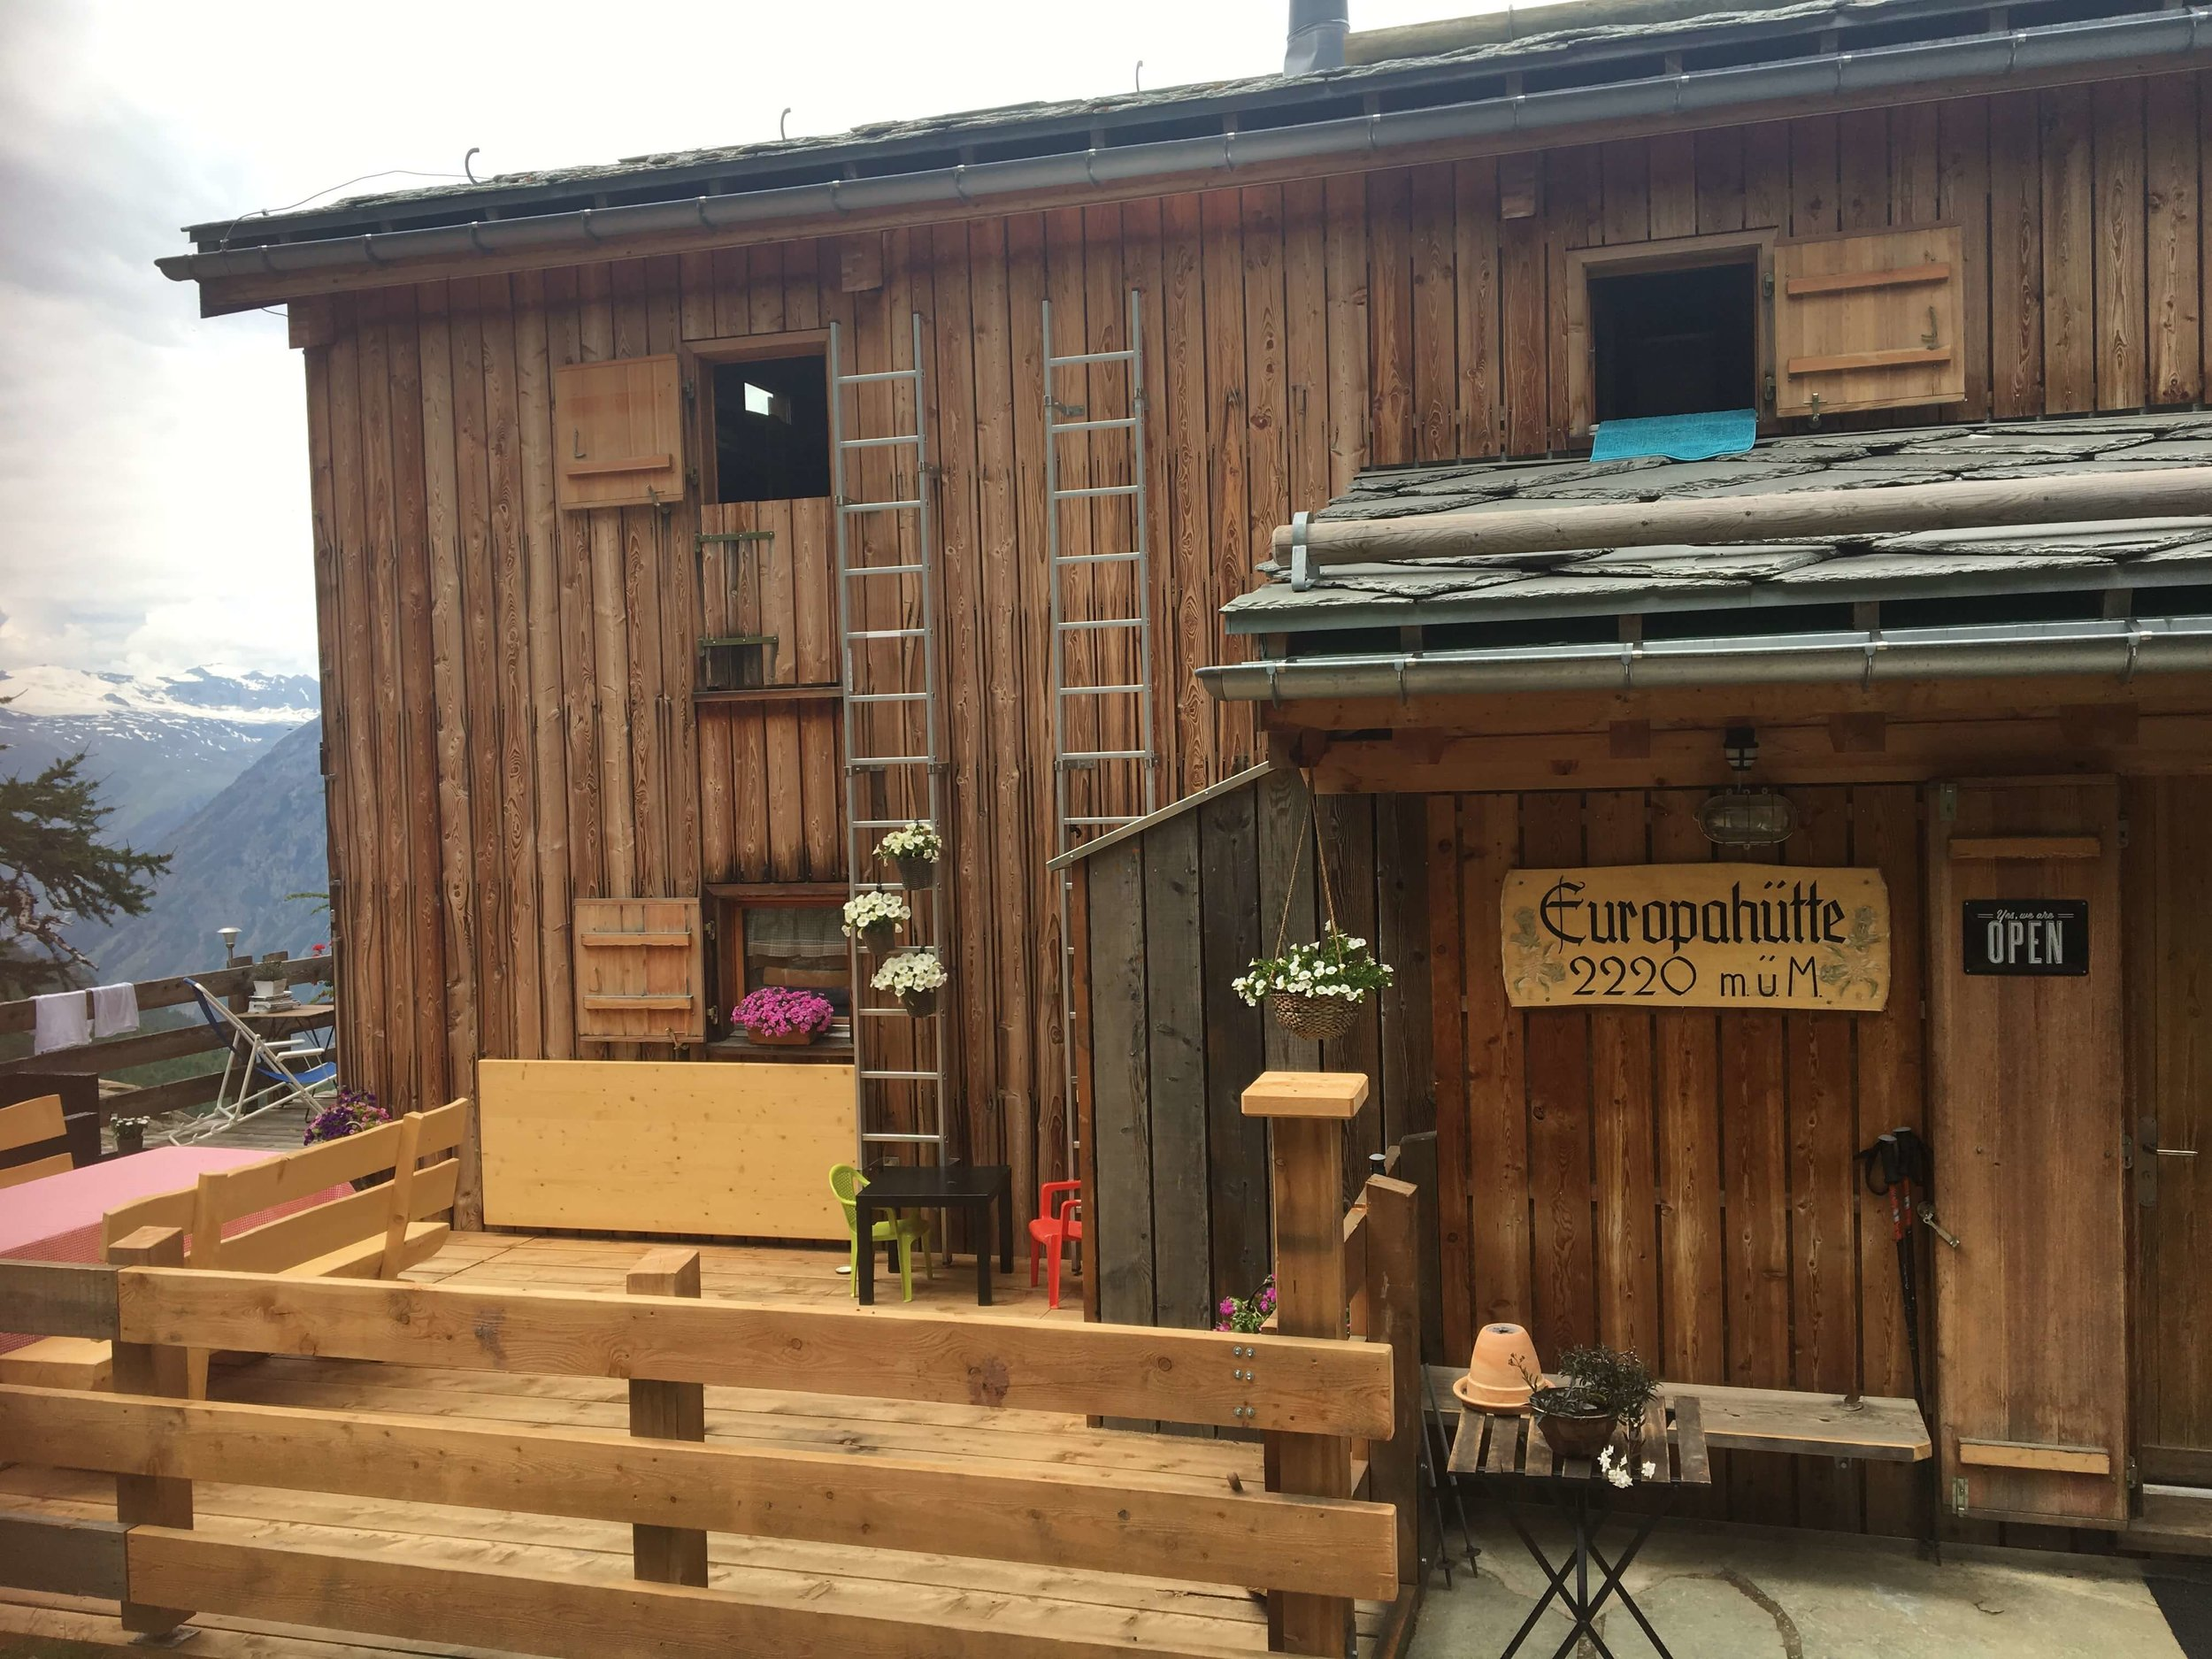 Haute Route Chamonix Zermatt accommodation